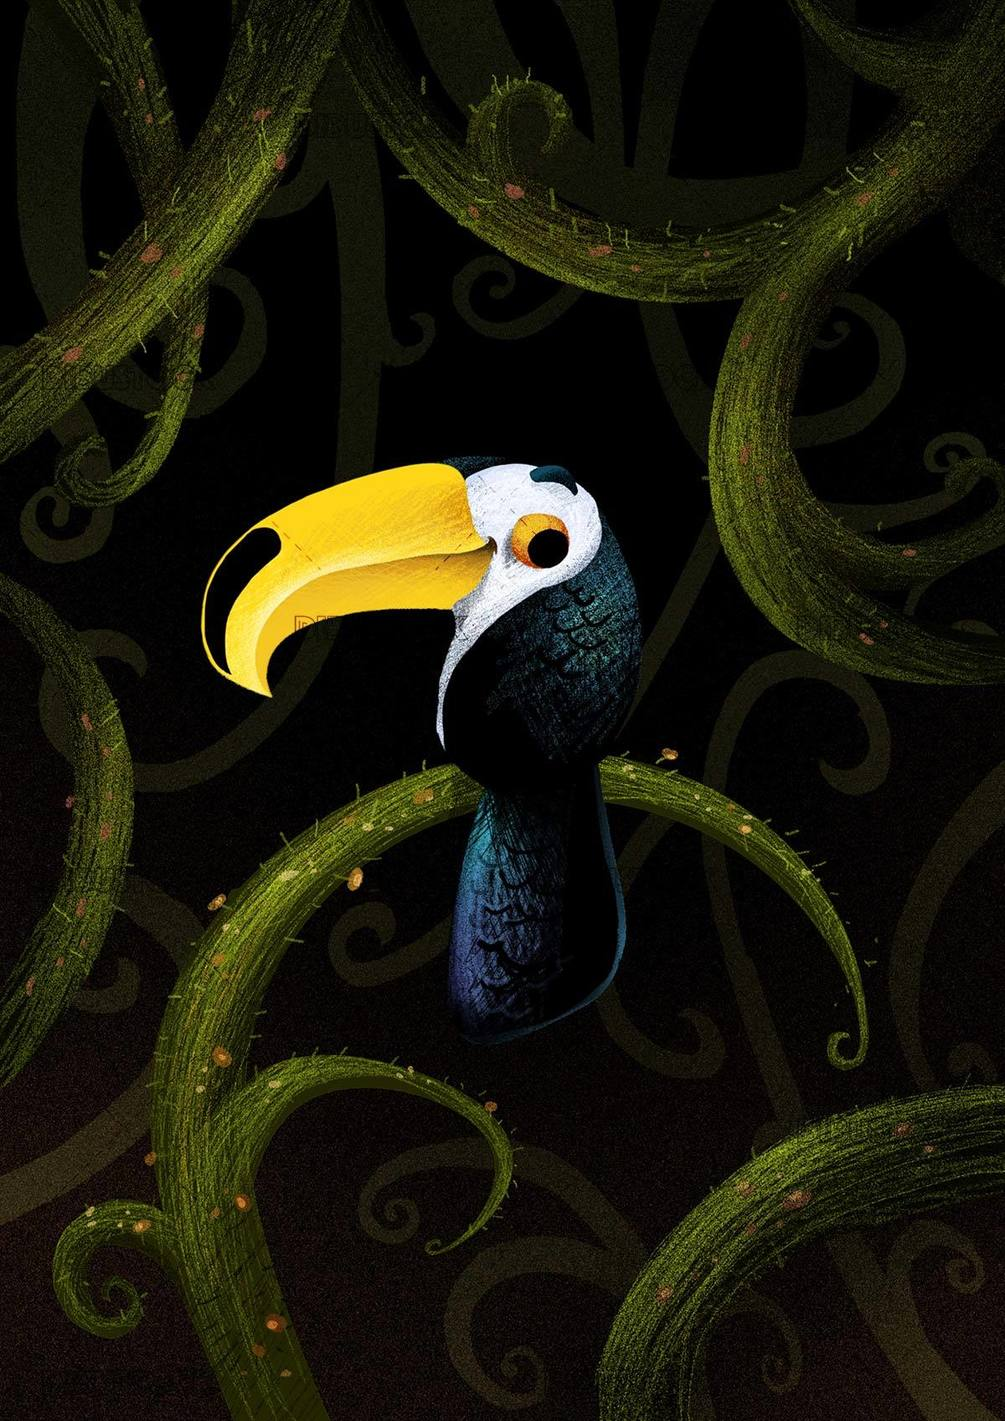 toucan between plants in the jungle